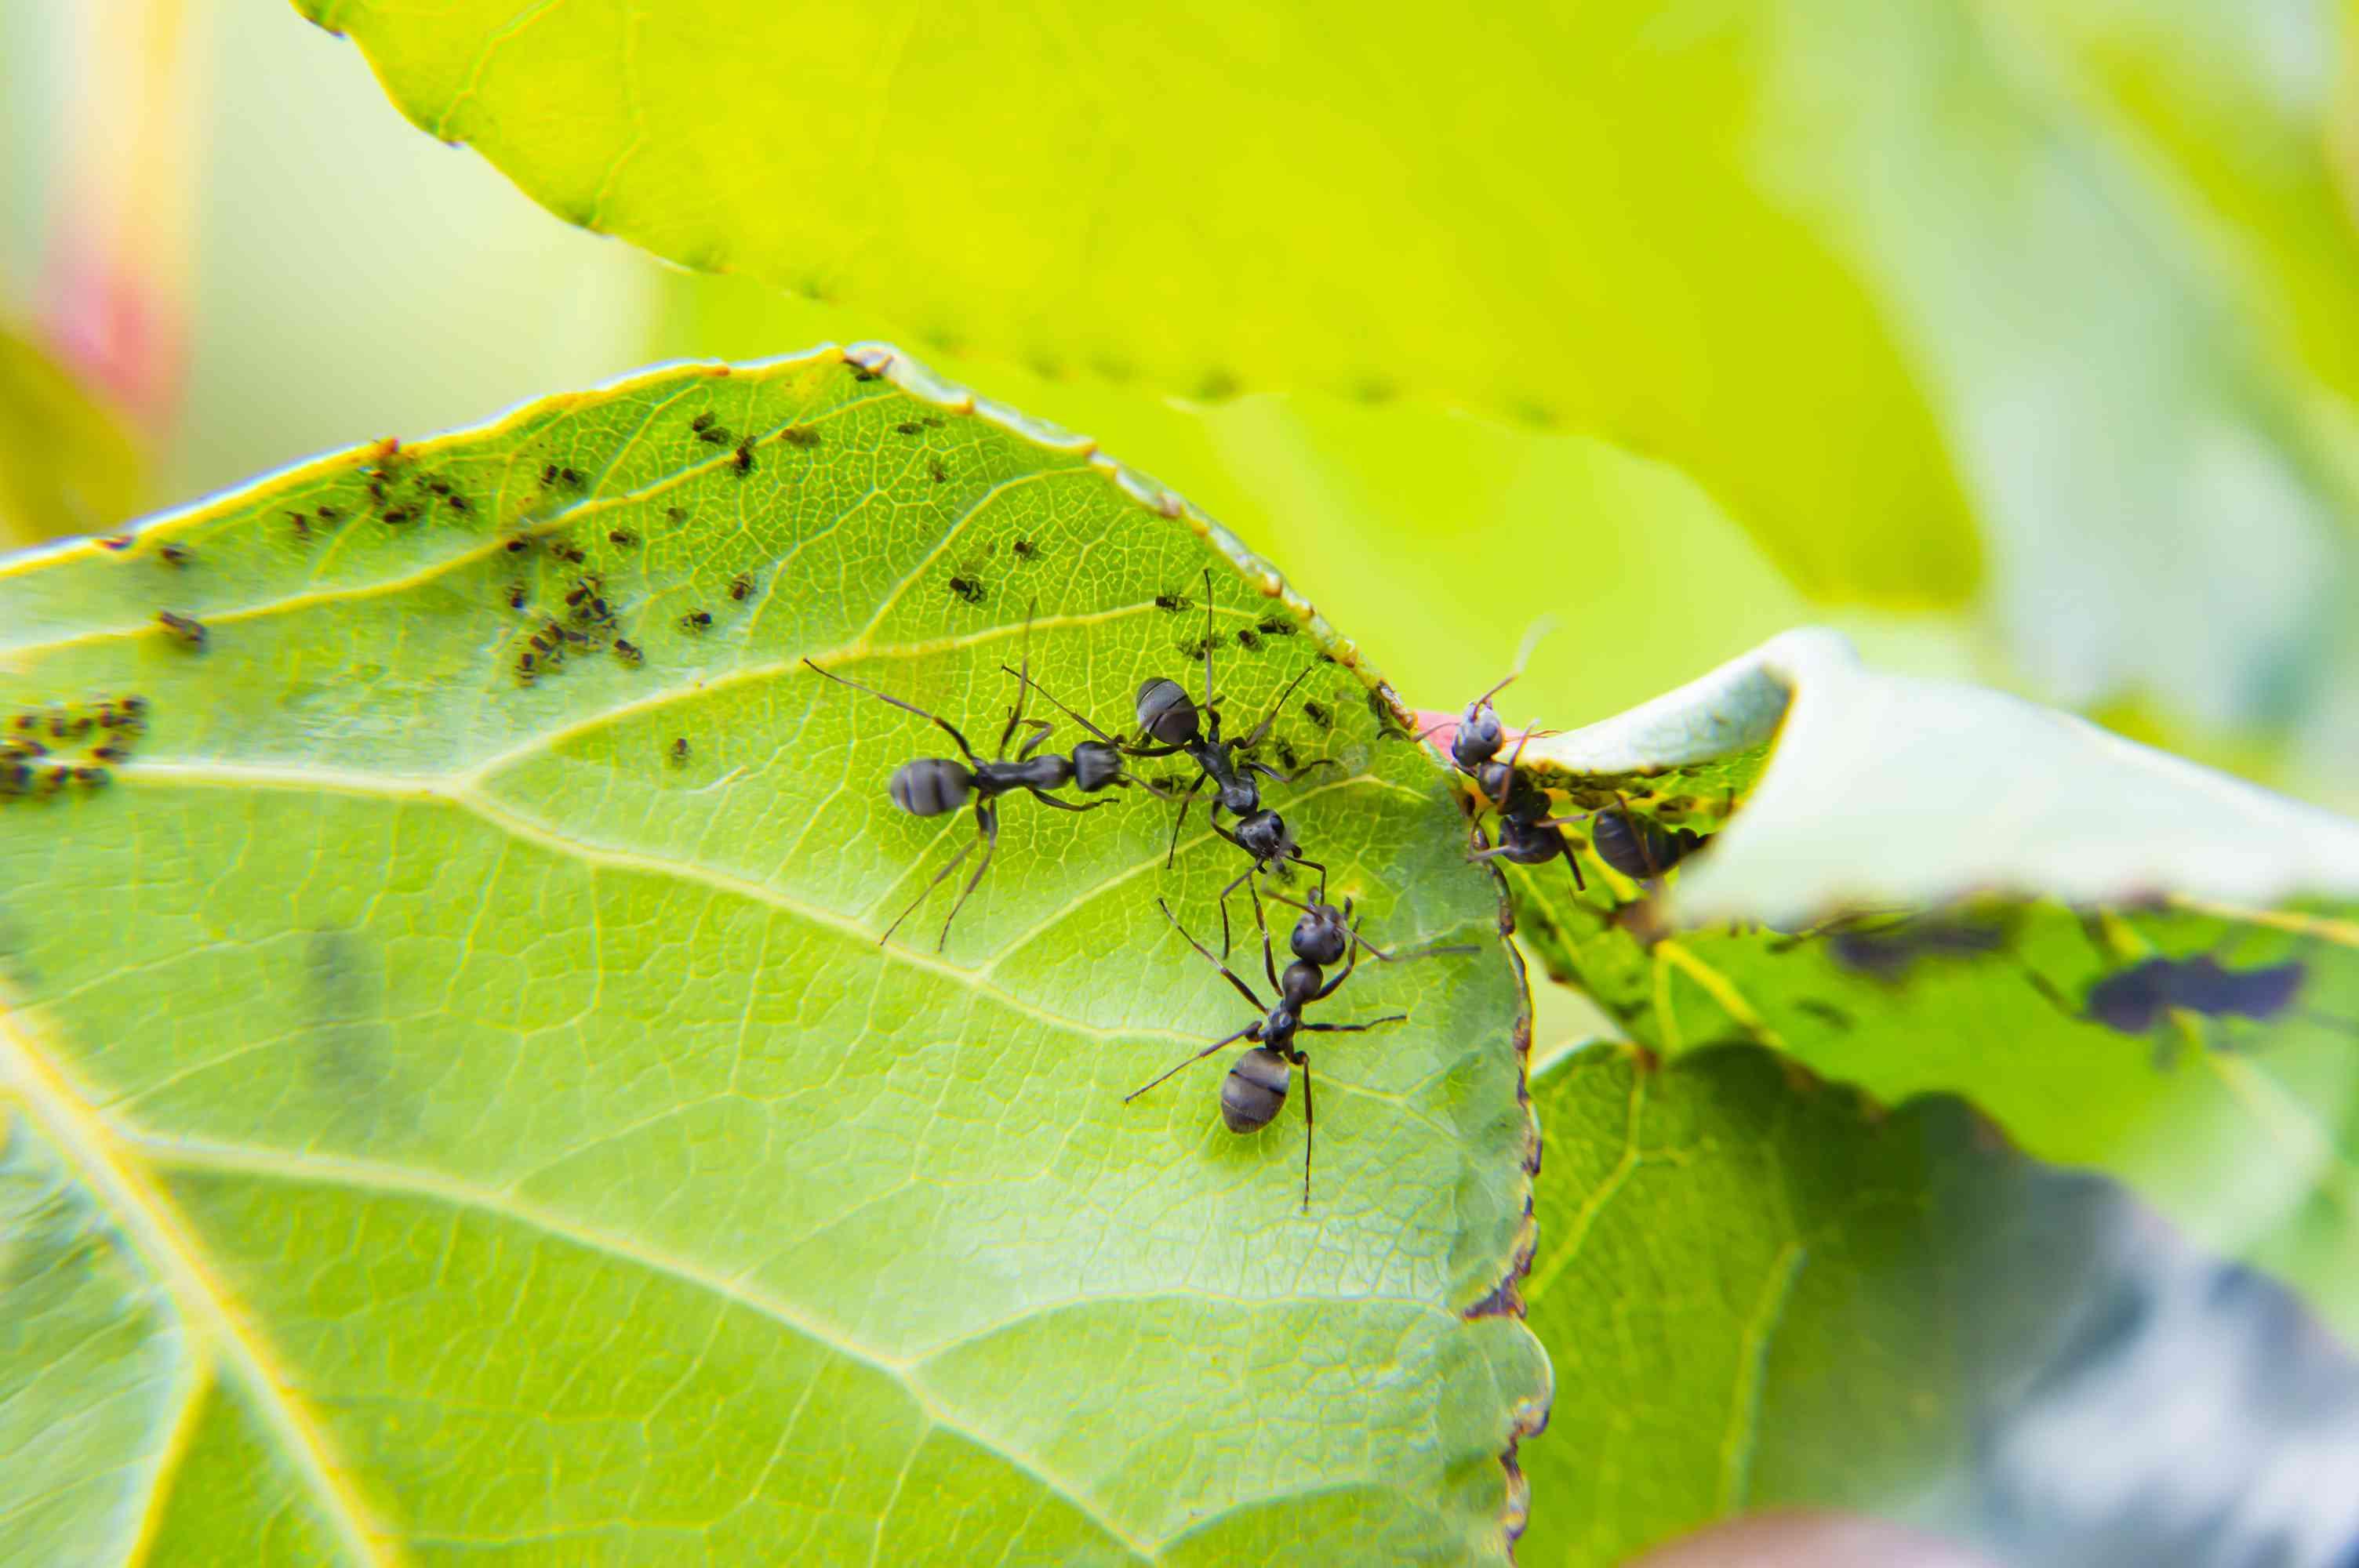 Carpenter Ants eating aphid honeydew